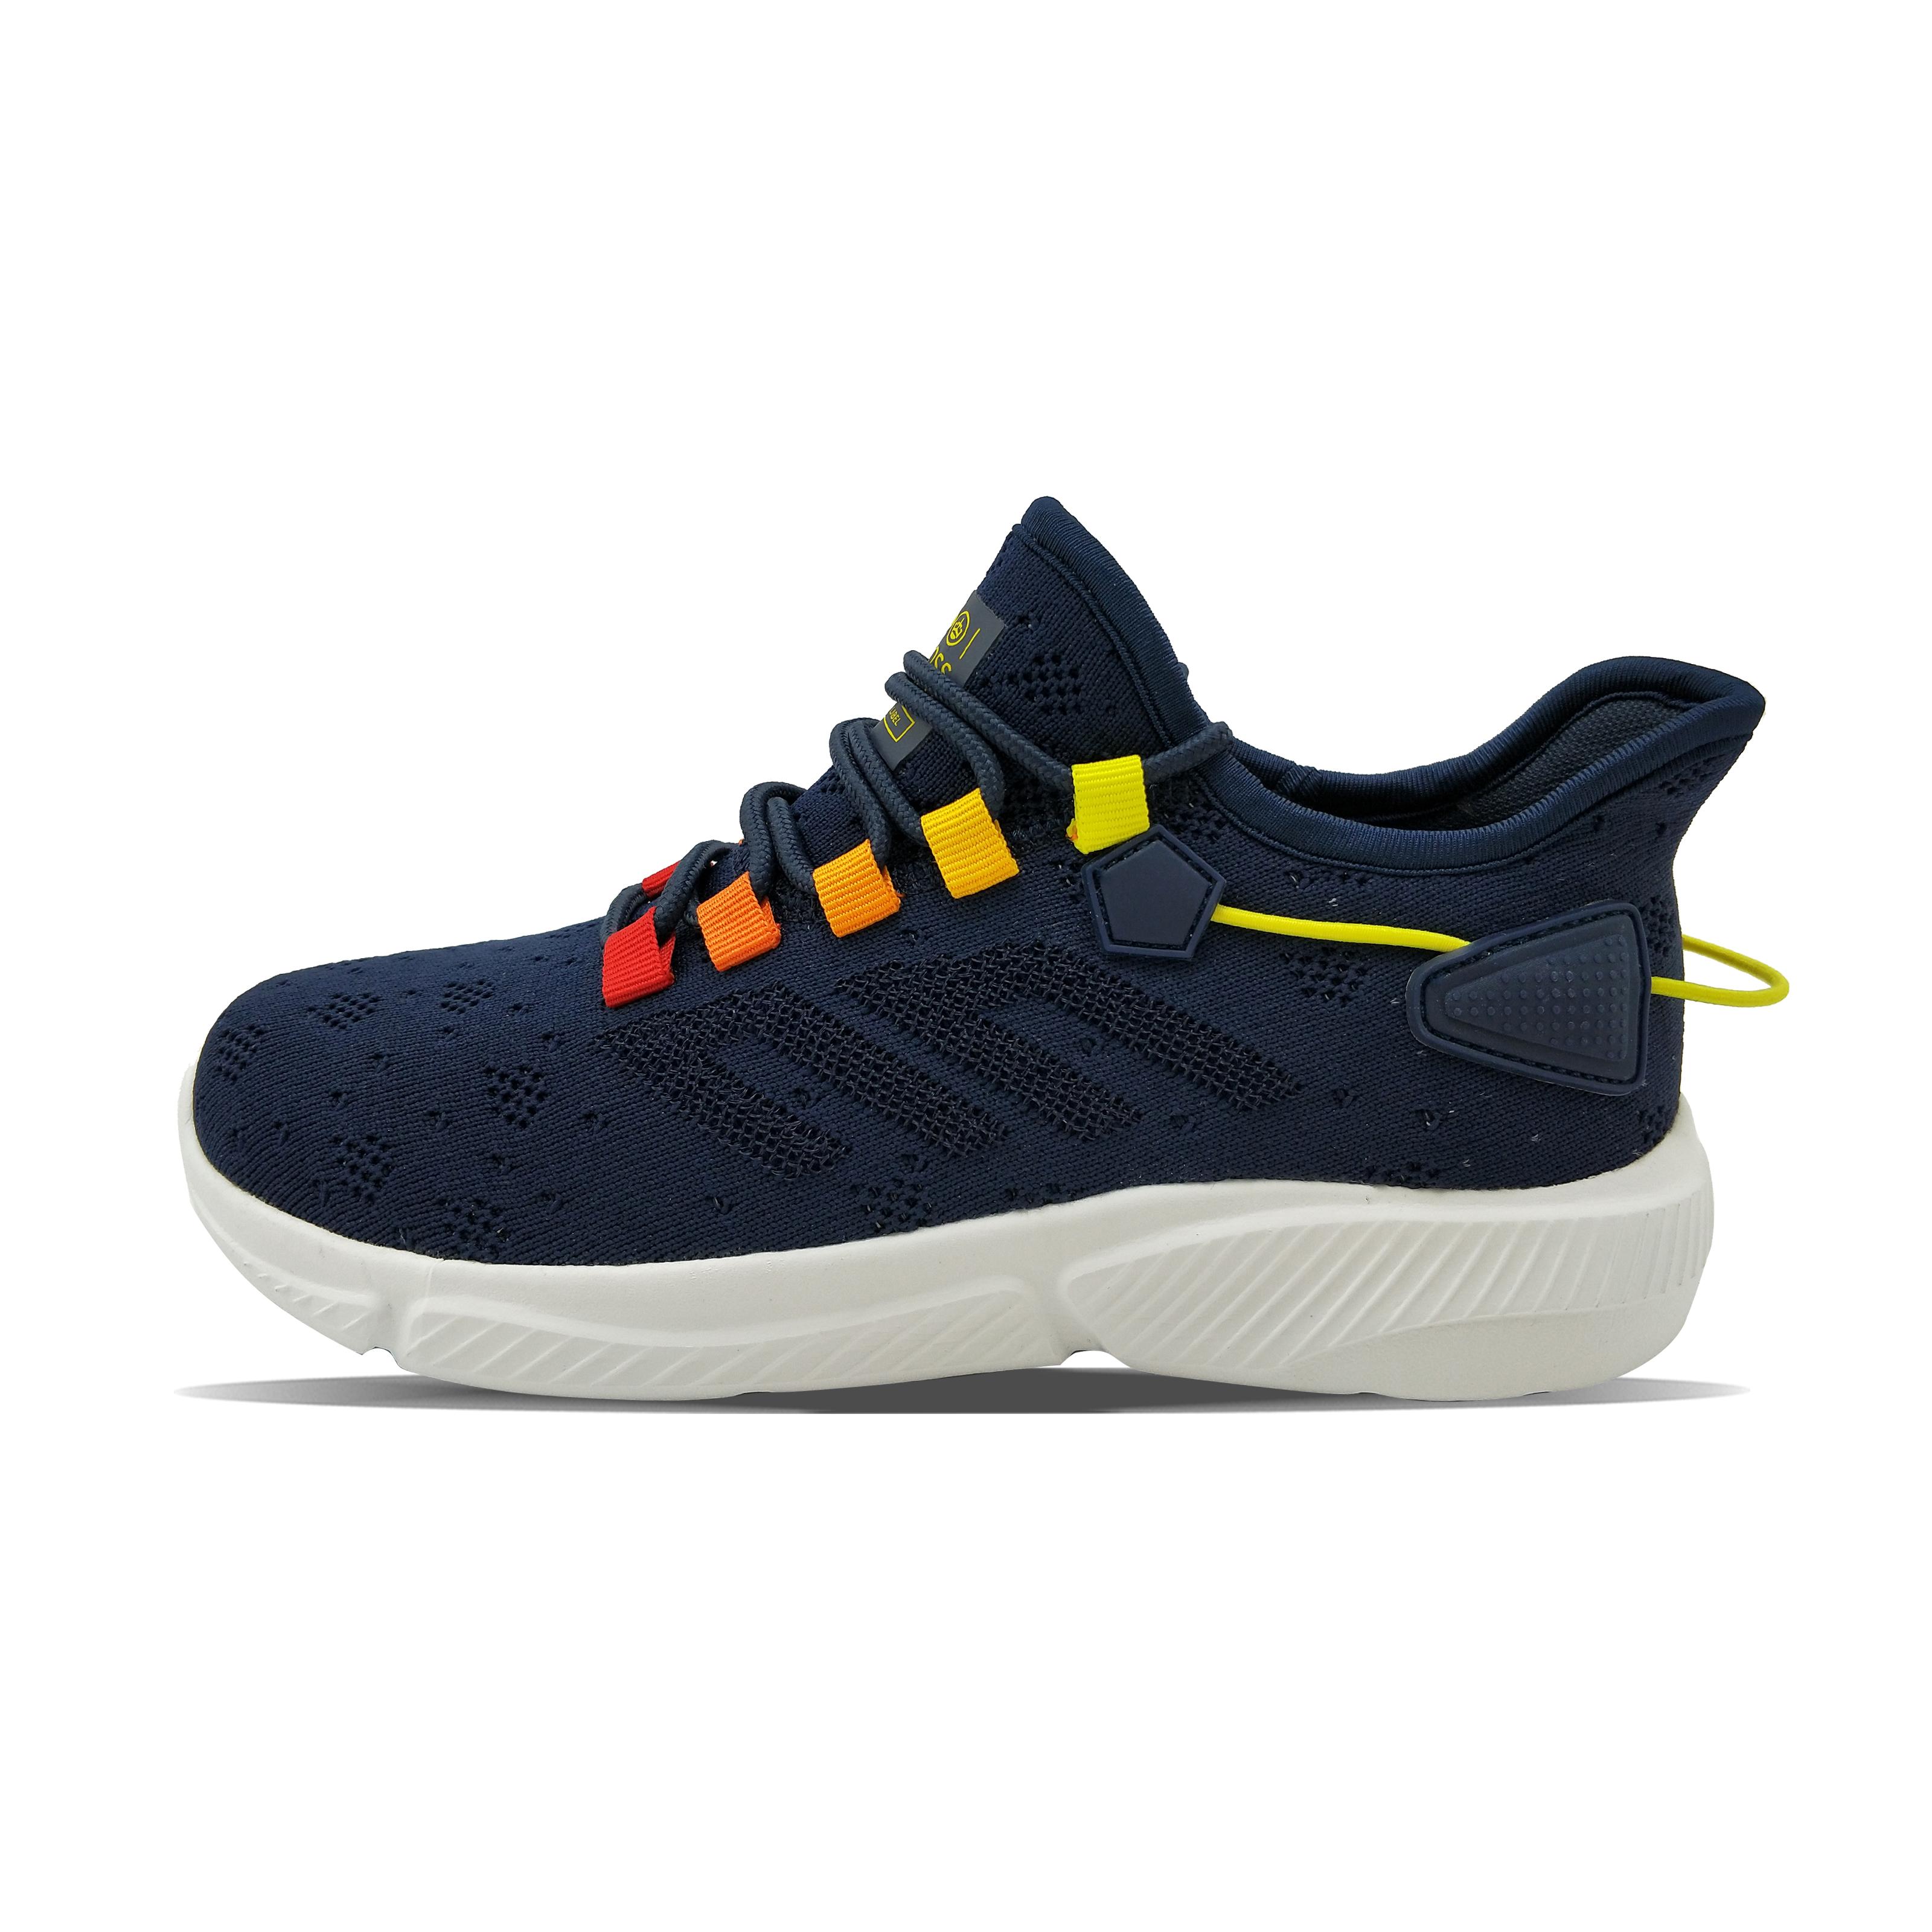 Pentagon PU rubber patch gradient color heel surrounding light boy's sneaker